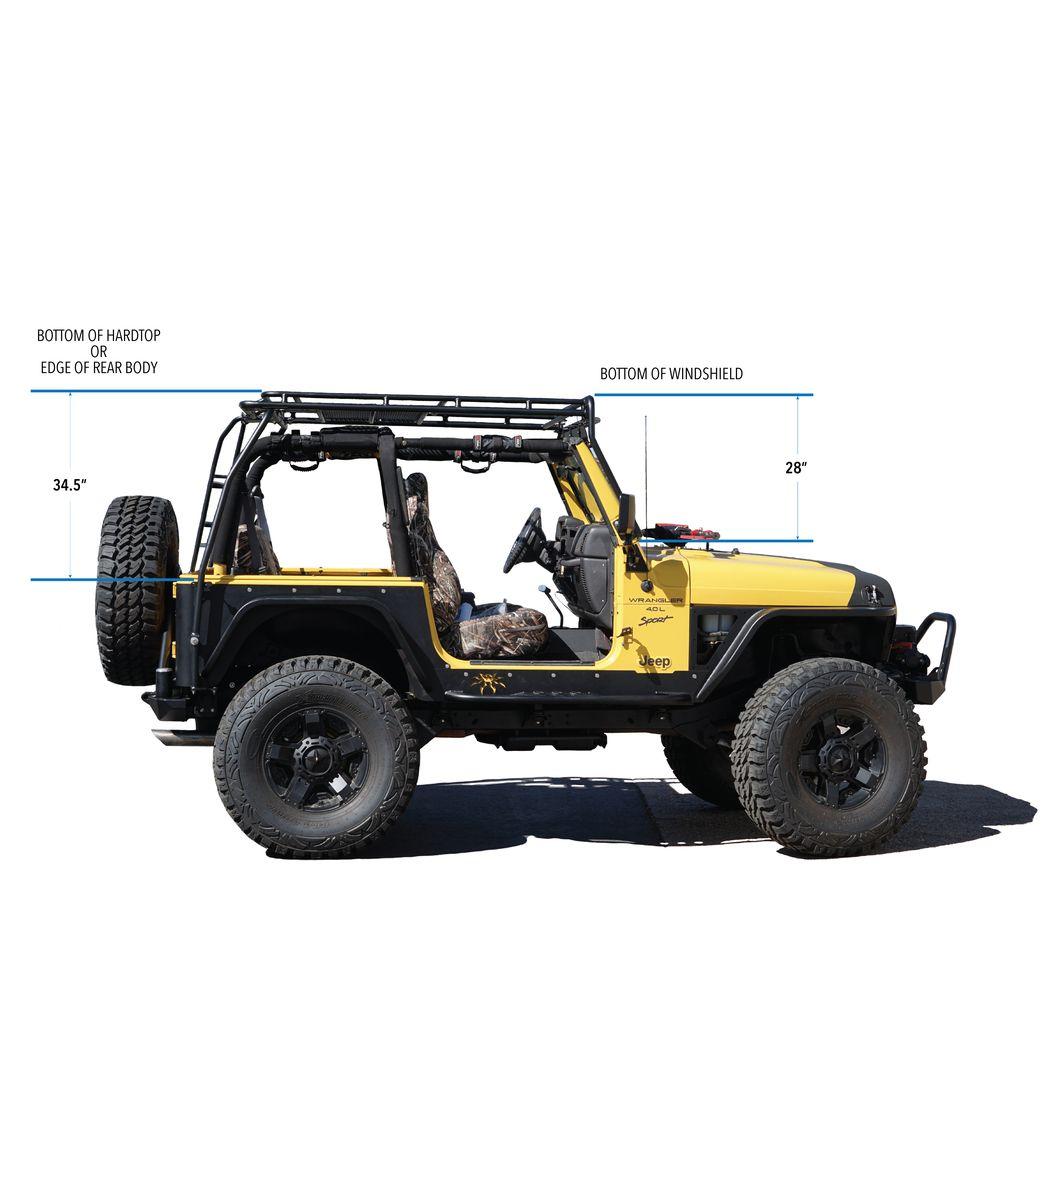 jeep wrangler tj jeep tj jeep wrangler